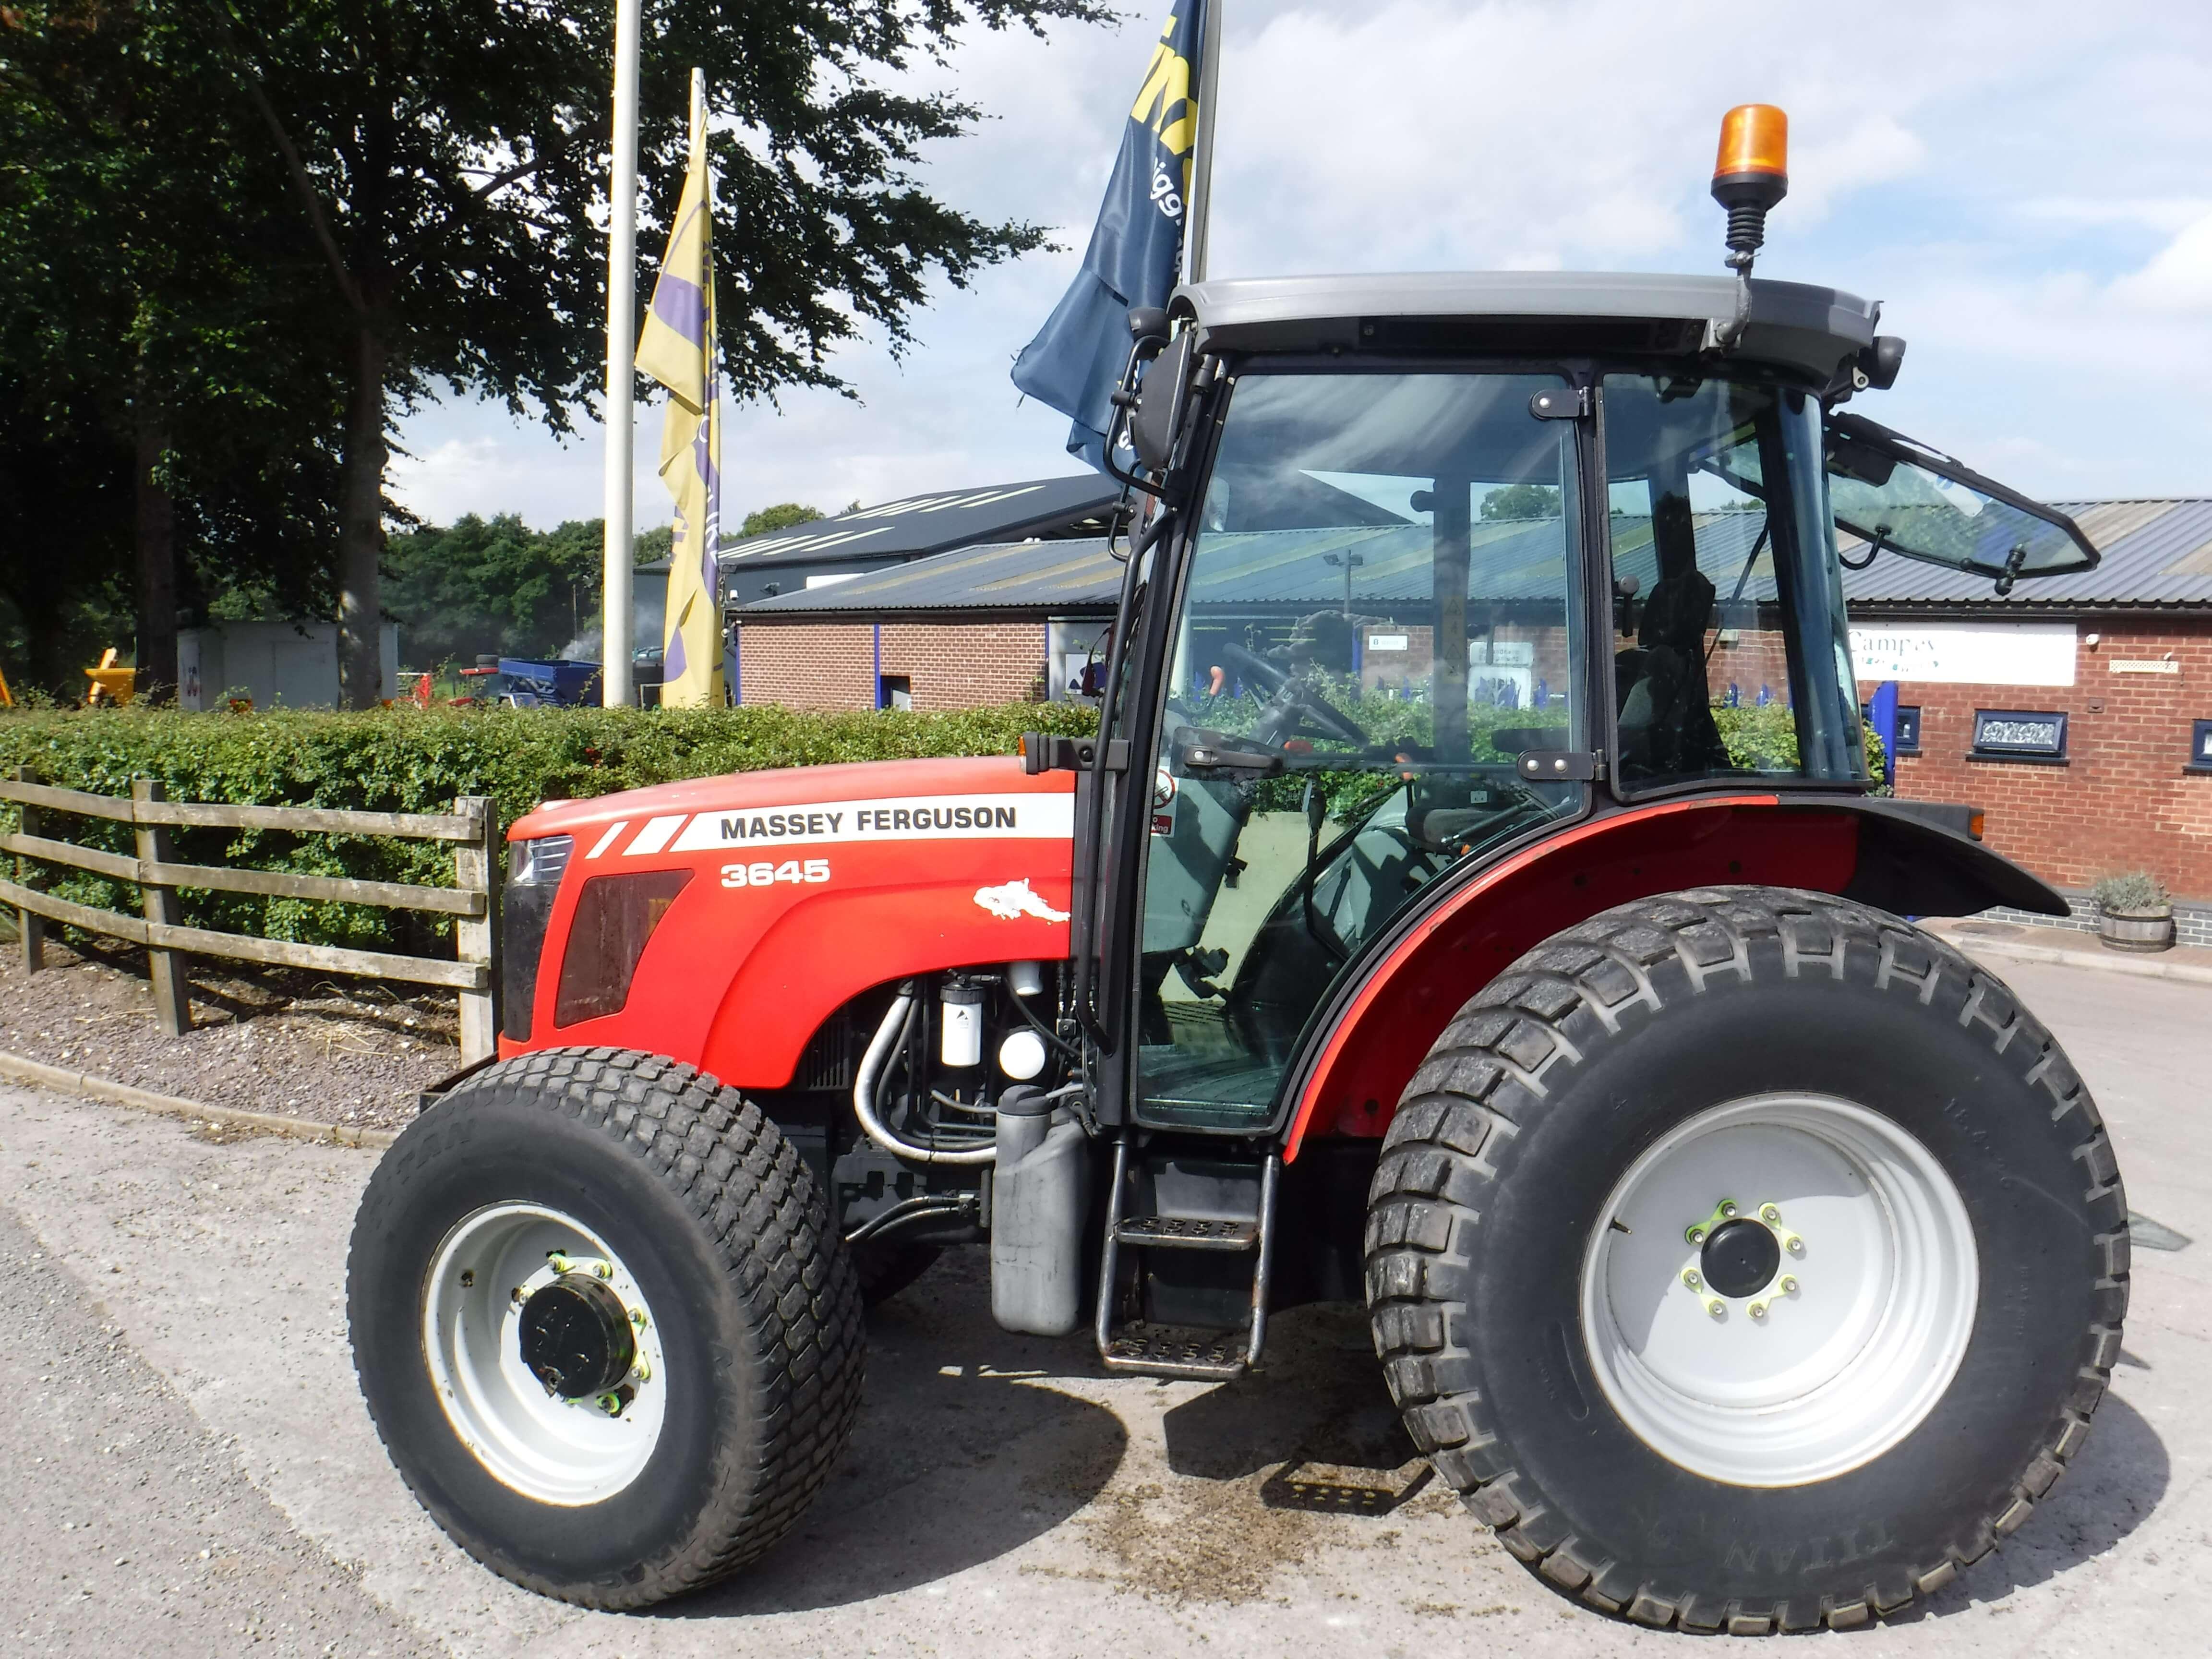 Massey Ferguson 3645 Tractor U3990